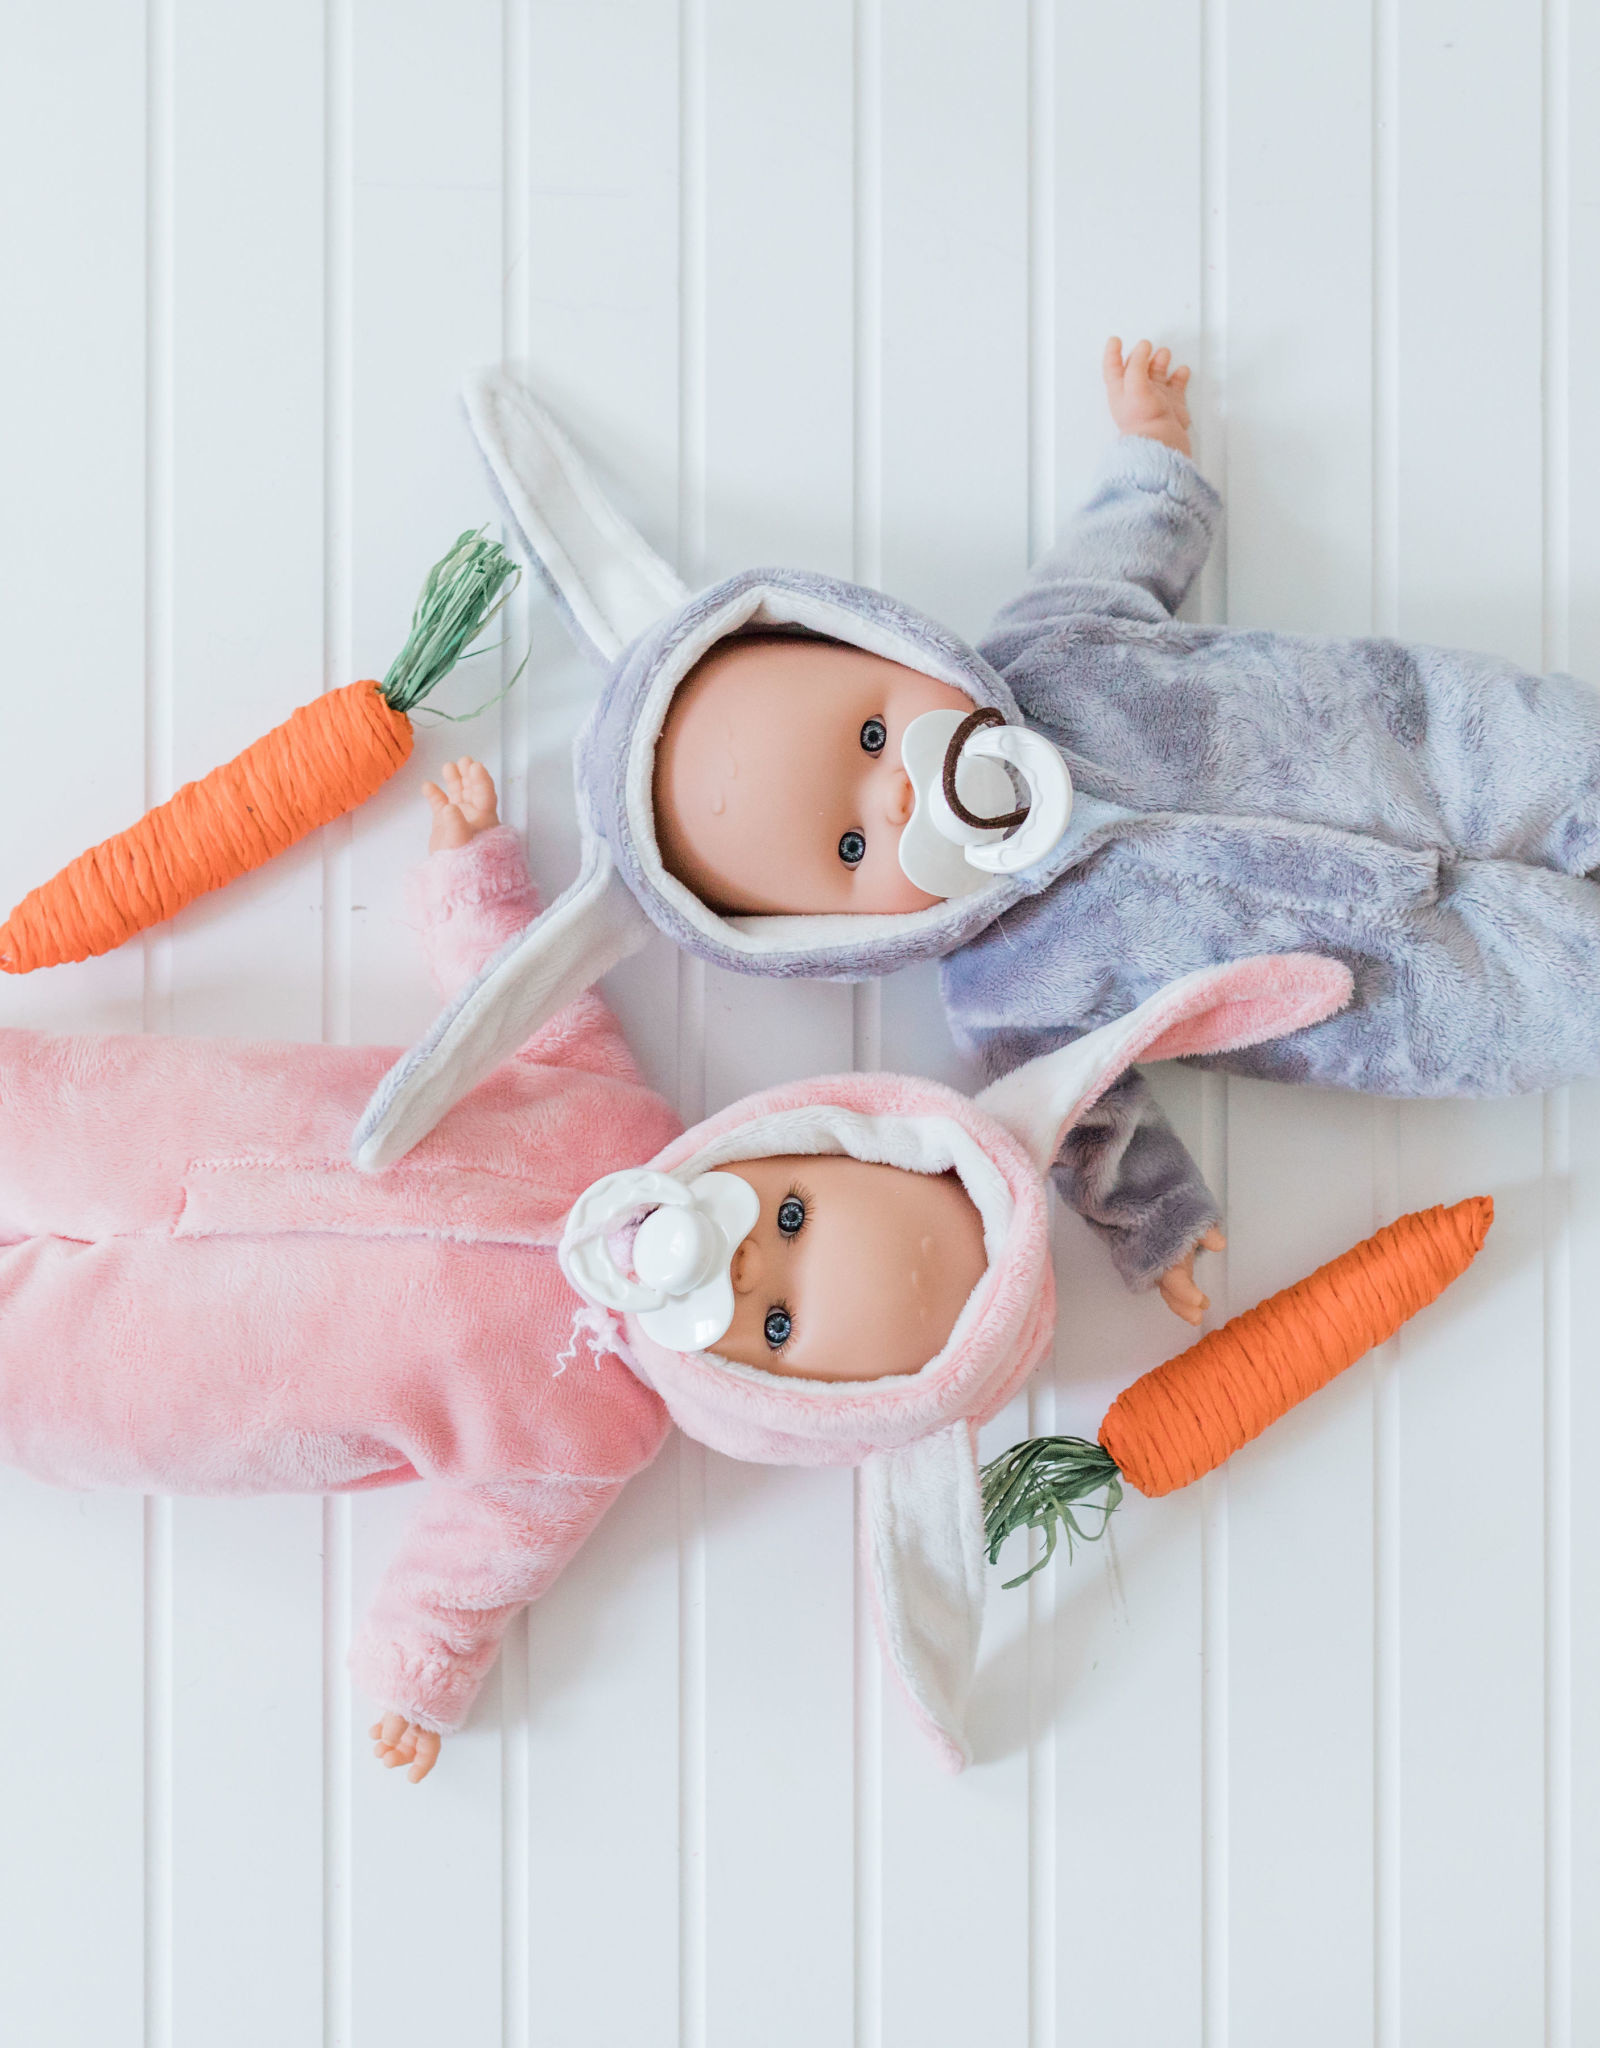 Paola Reina Alex & Sonia doll- Alex in gray rabbit pajamas